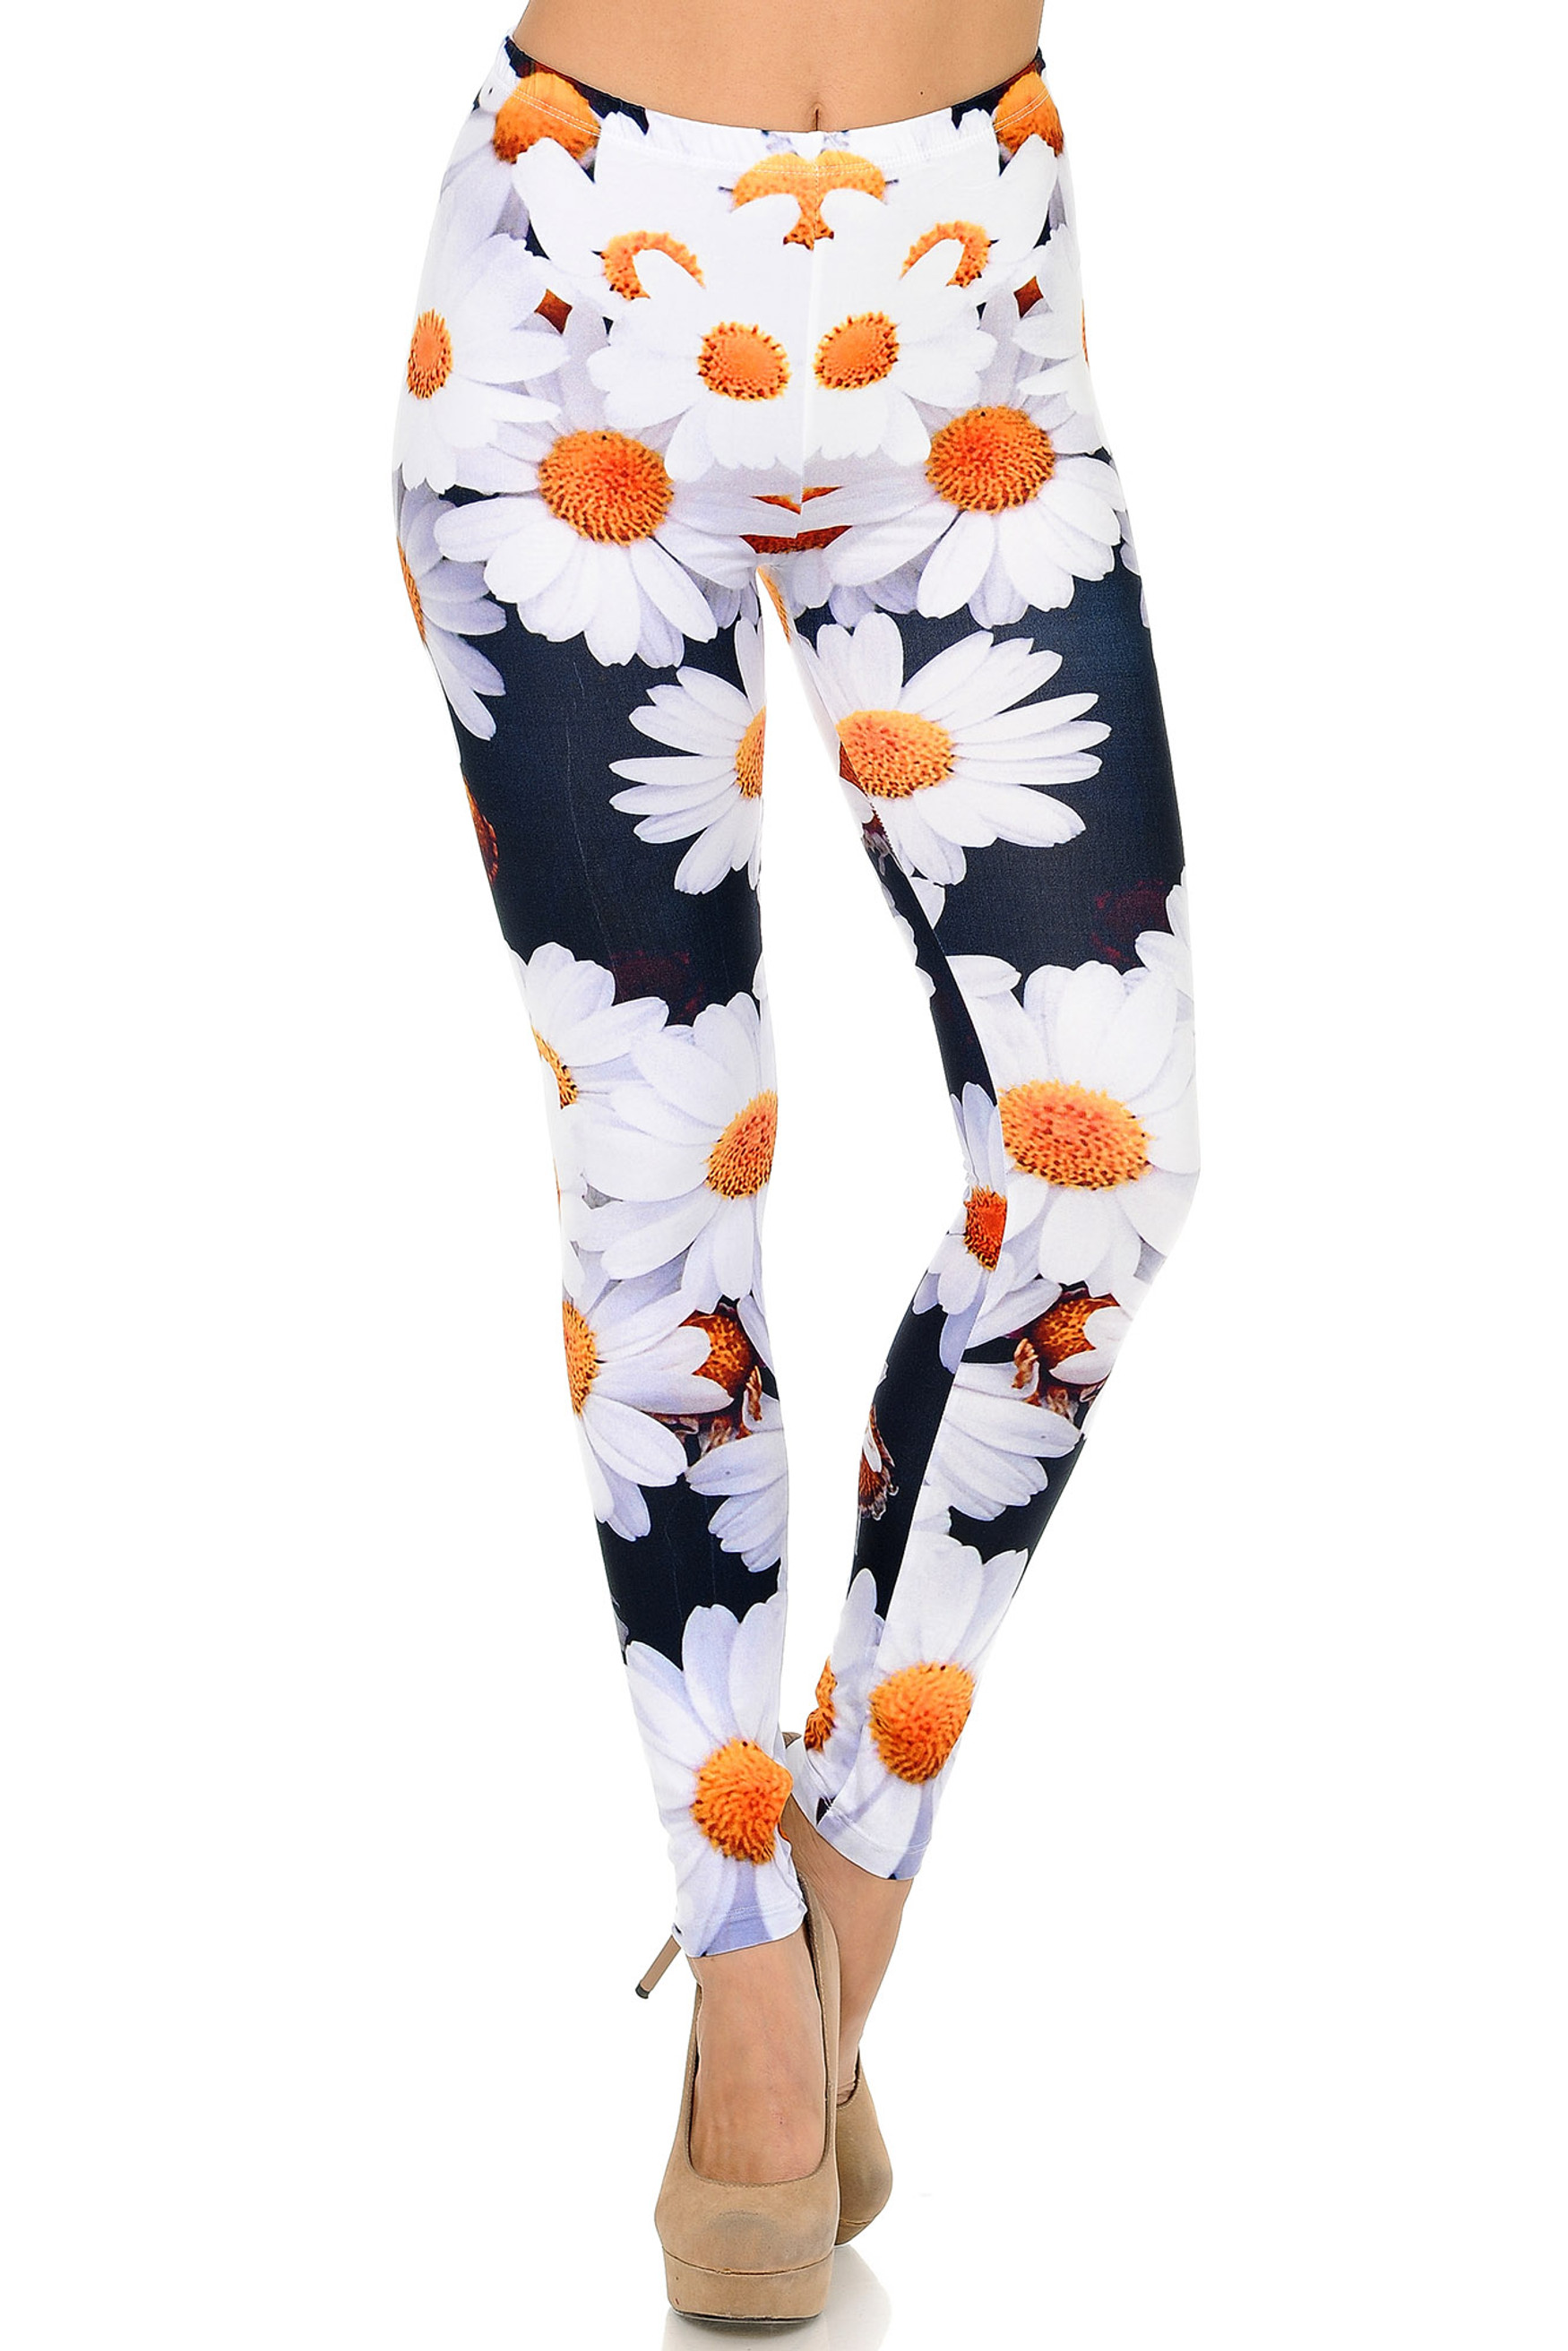 Front side image of Creamy Soft Daisy Plus Size Leggings - USA Fashion™